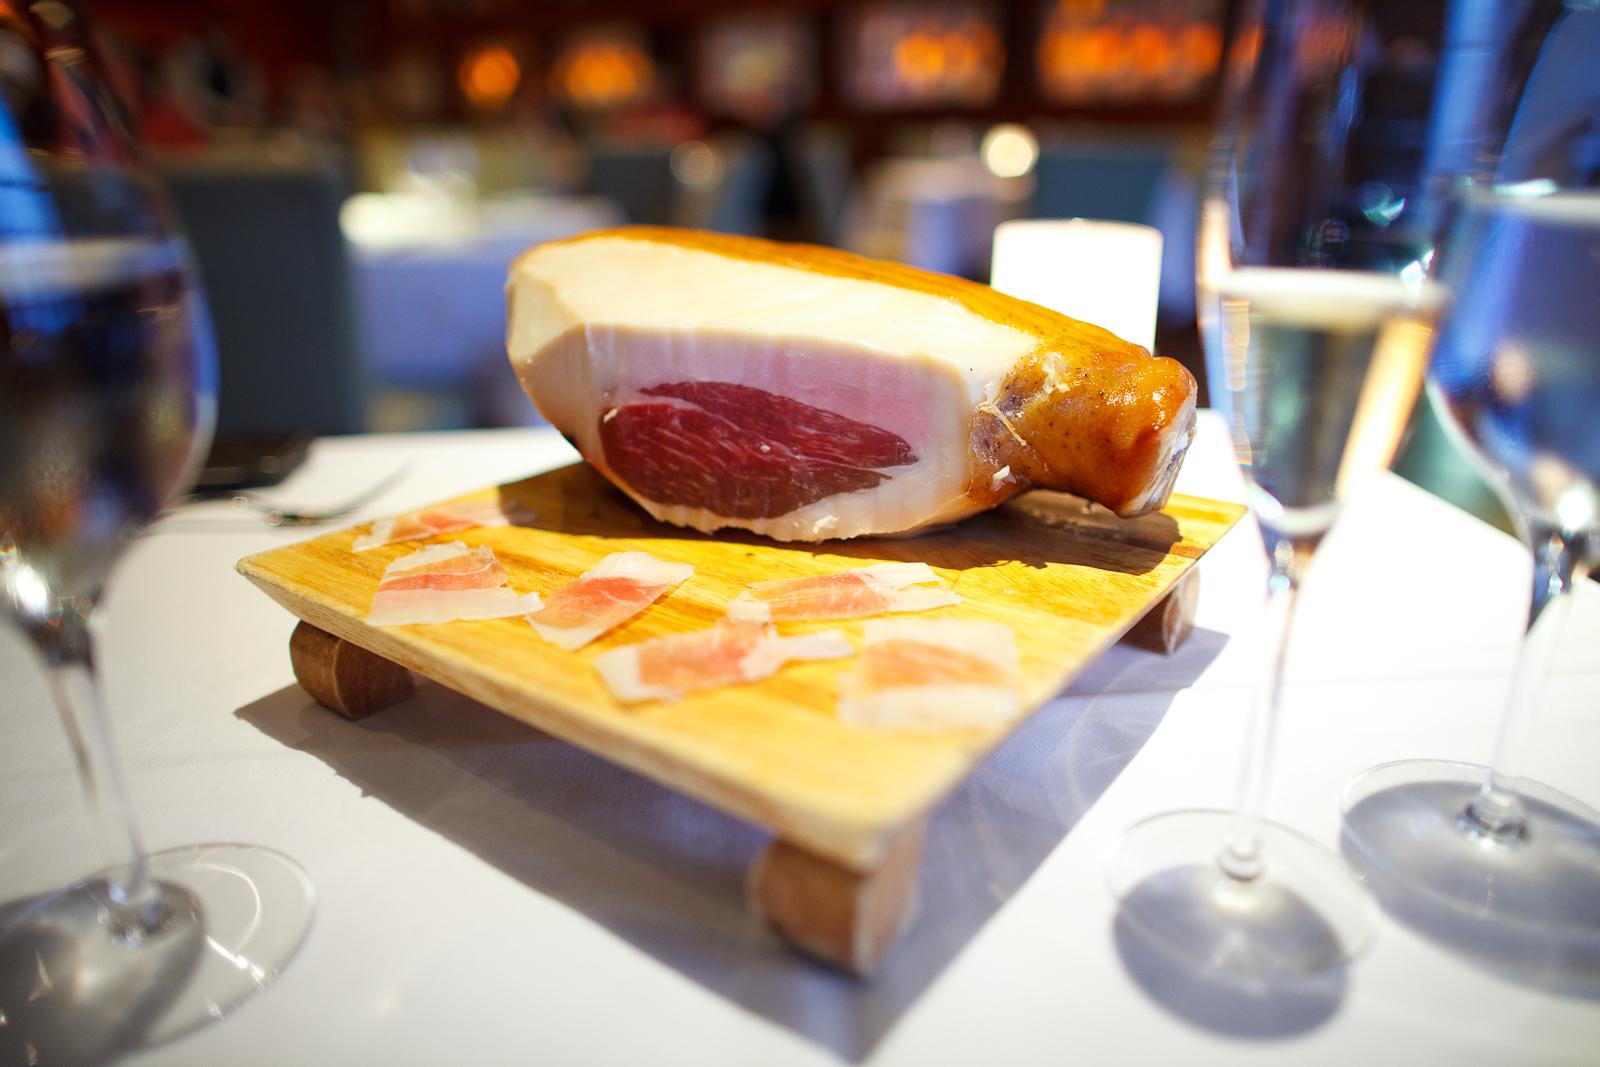 Snacks 3: Ossabaw ham aged at the restaurant